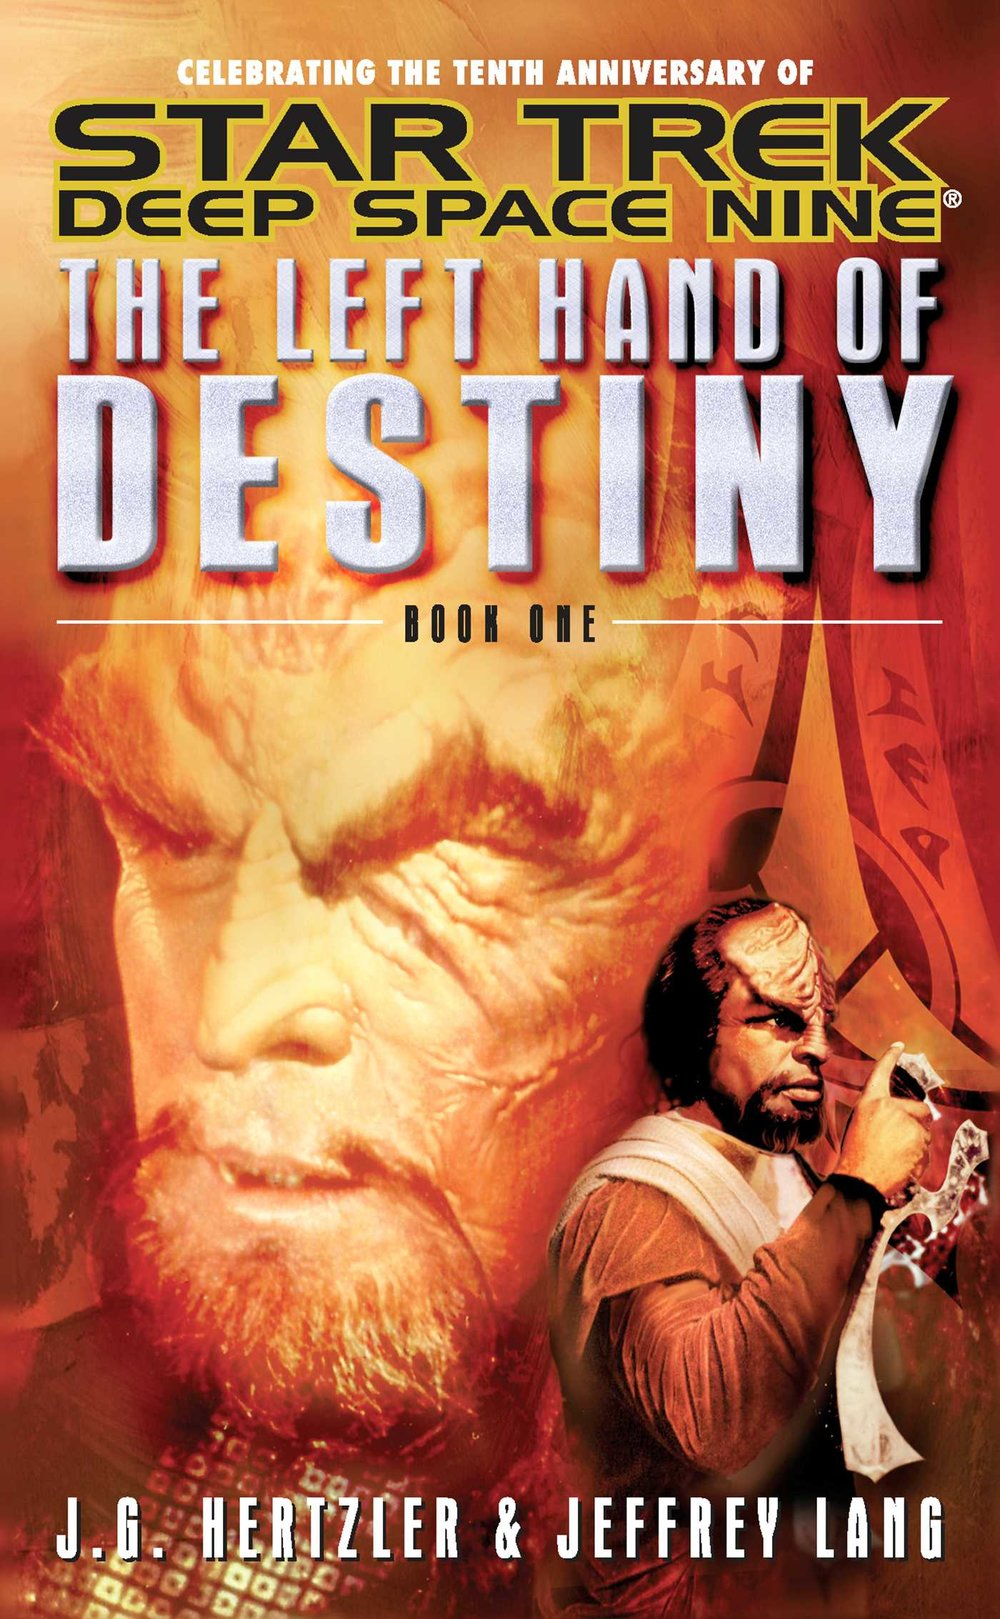 the-left-hand-of-destiny-book-1-9780743423281_hr.jpg